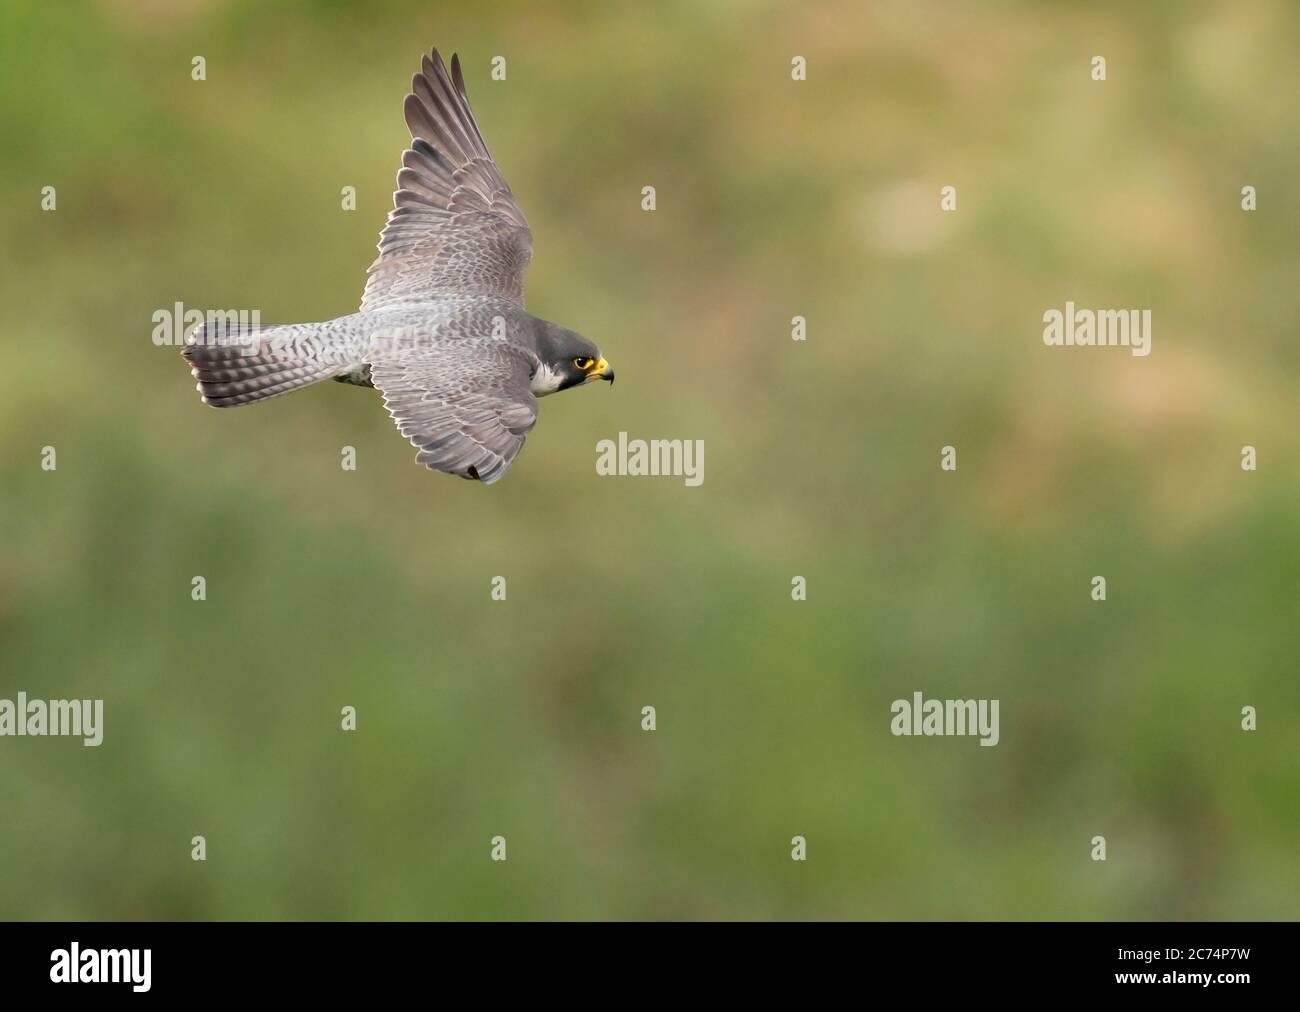 An adult Peregrine Falcon (Falco peregrinus) in flight over the Avon Gorge, Bristol Stock Photo